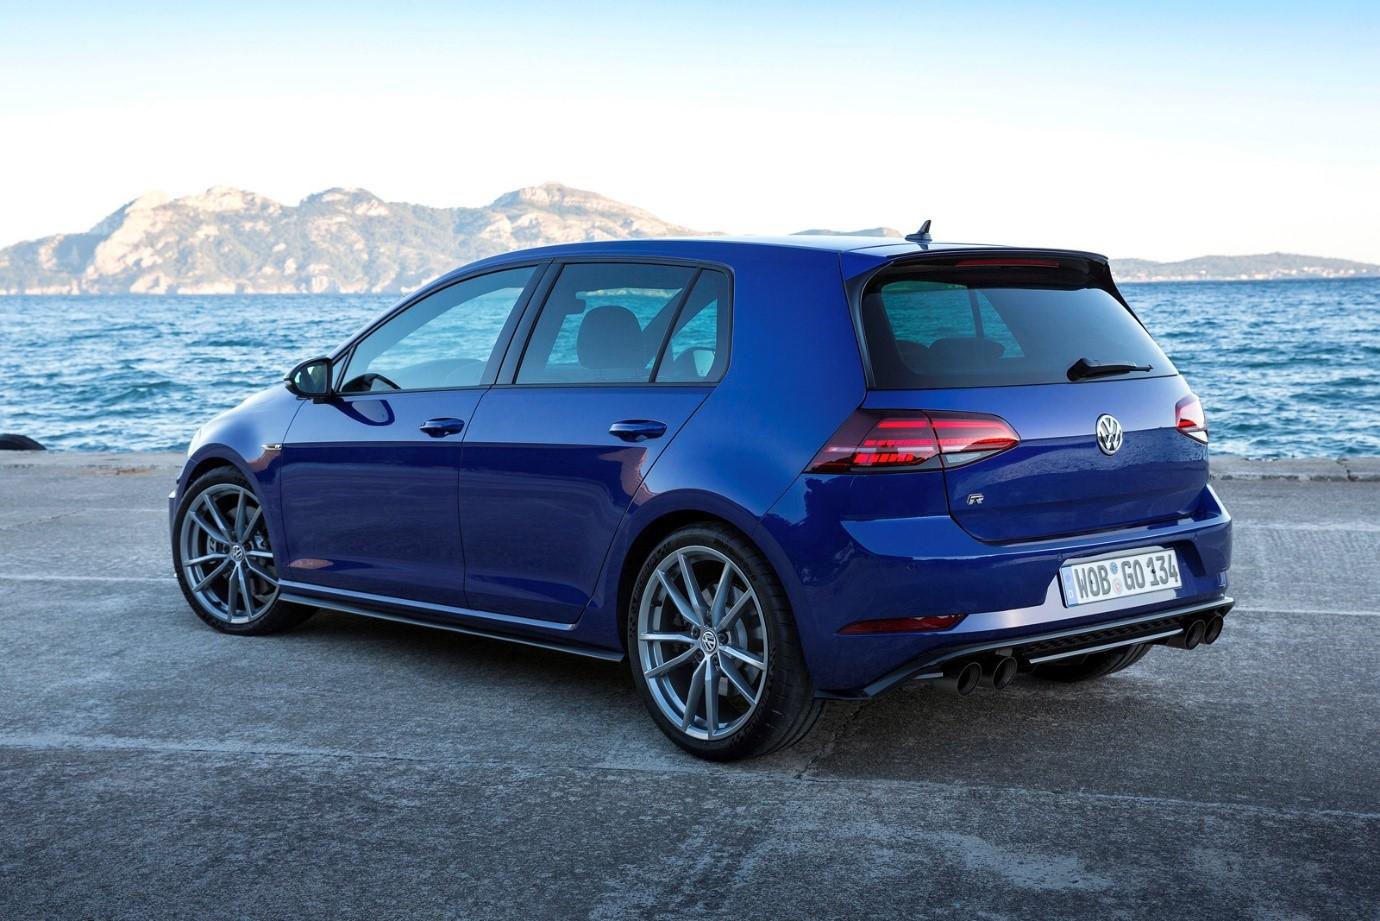 VW Golf R (performance kit) - MS+ BLOG